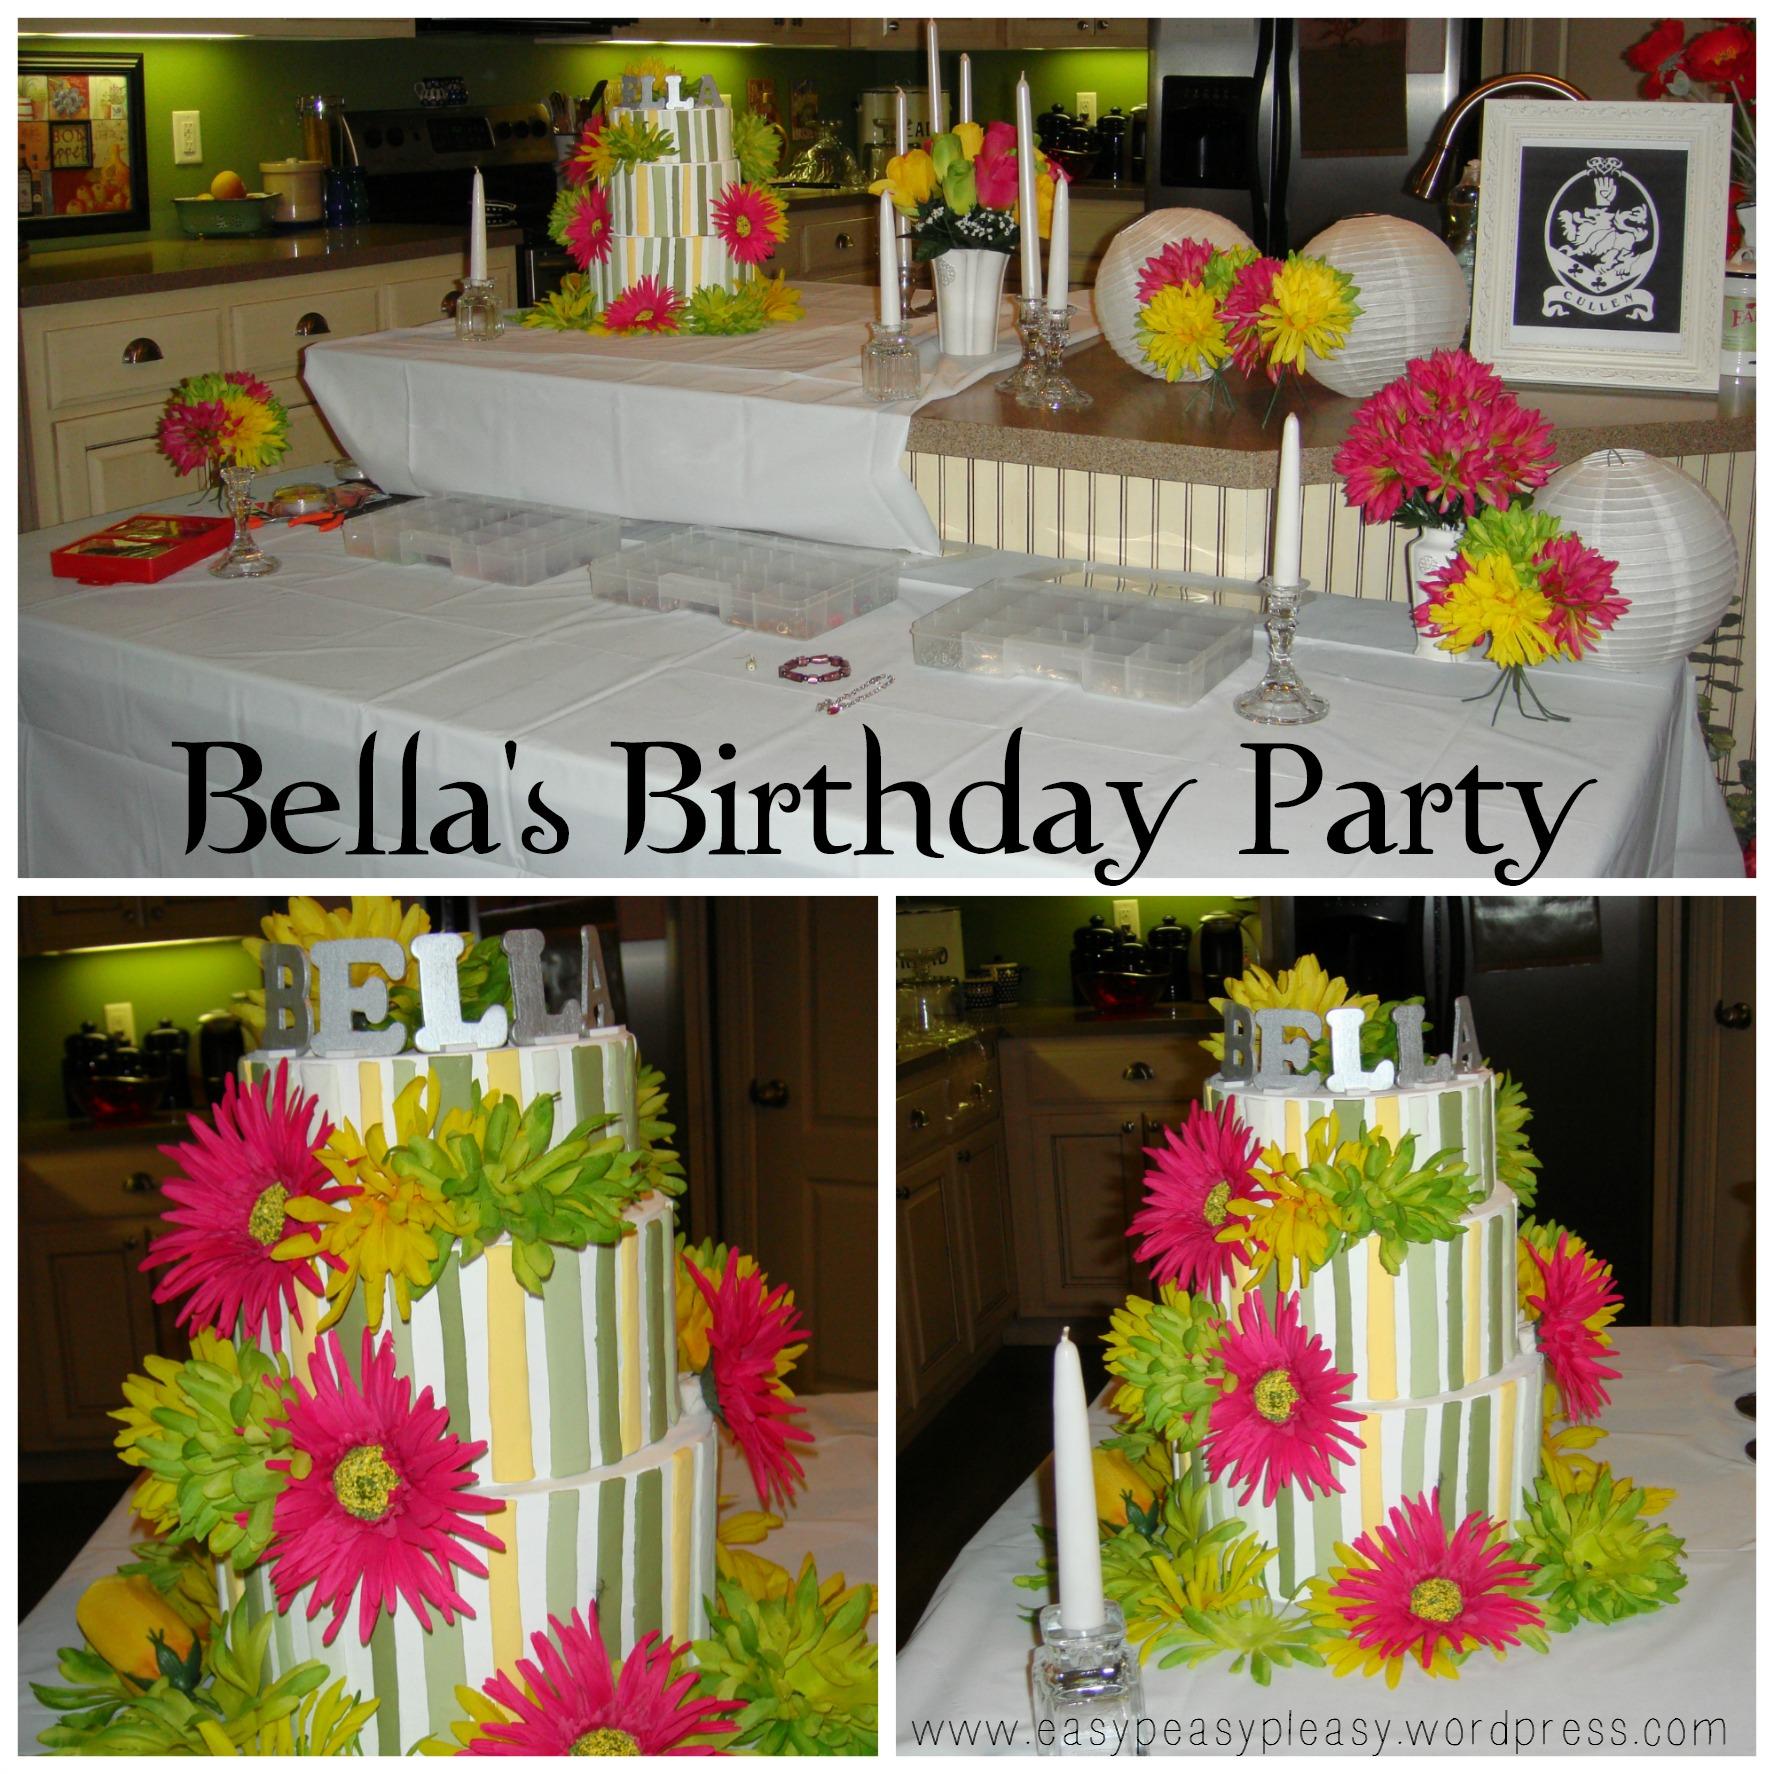 Twilight New Moon Bella's Birthday Party Decor